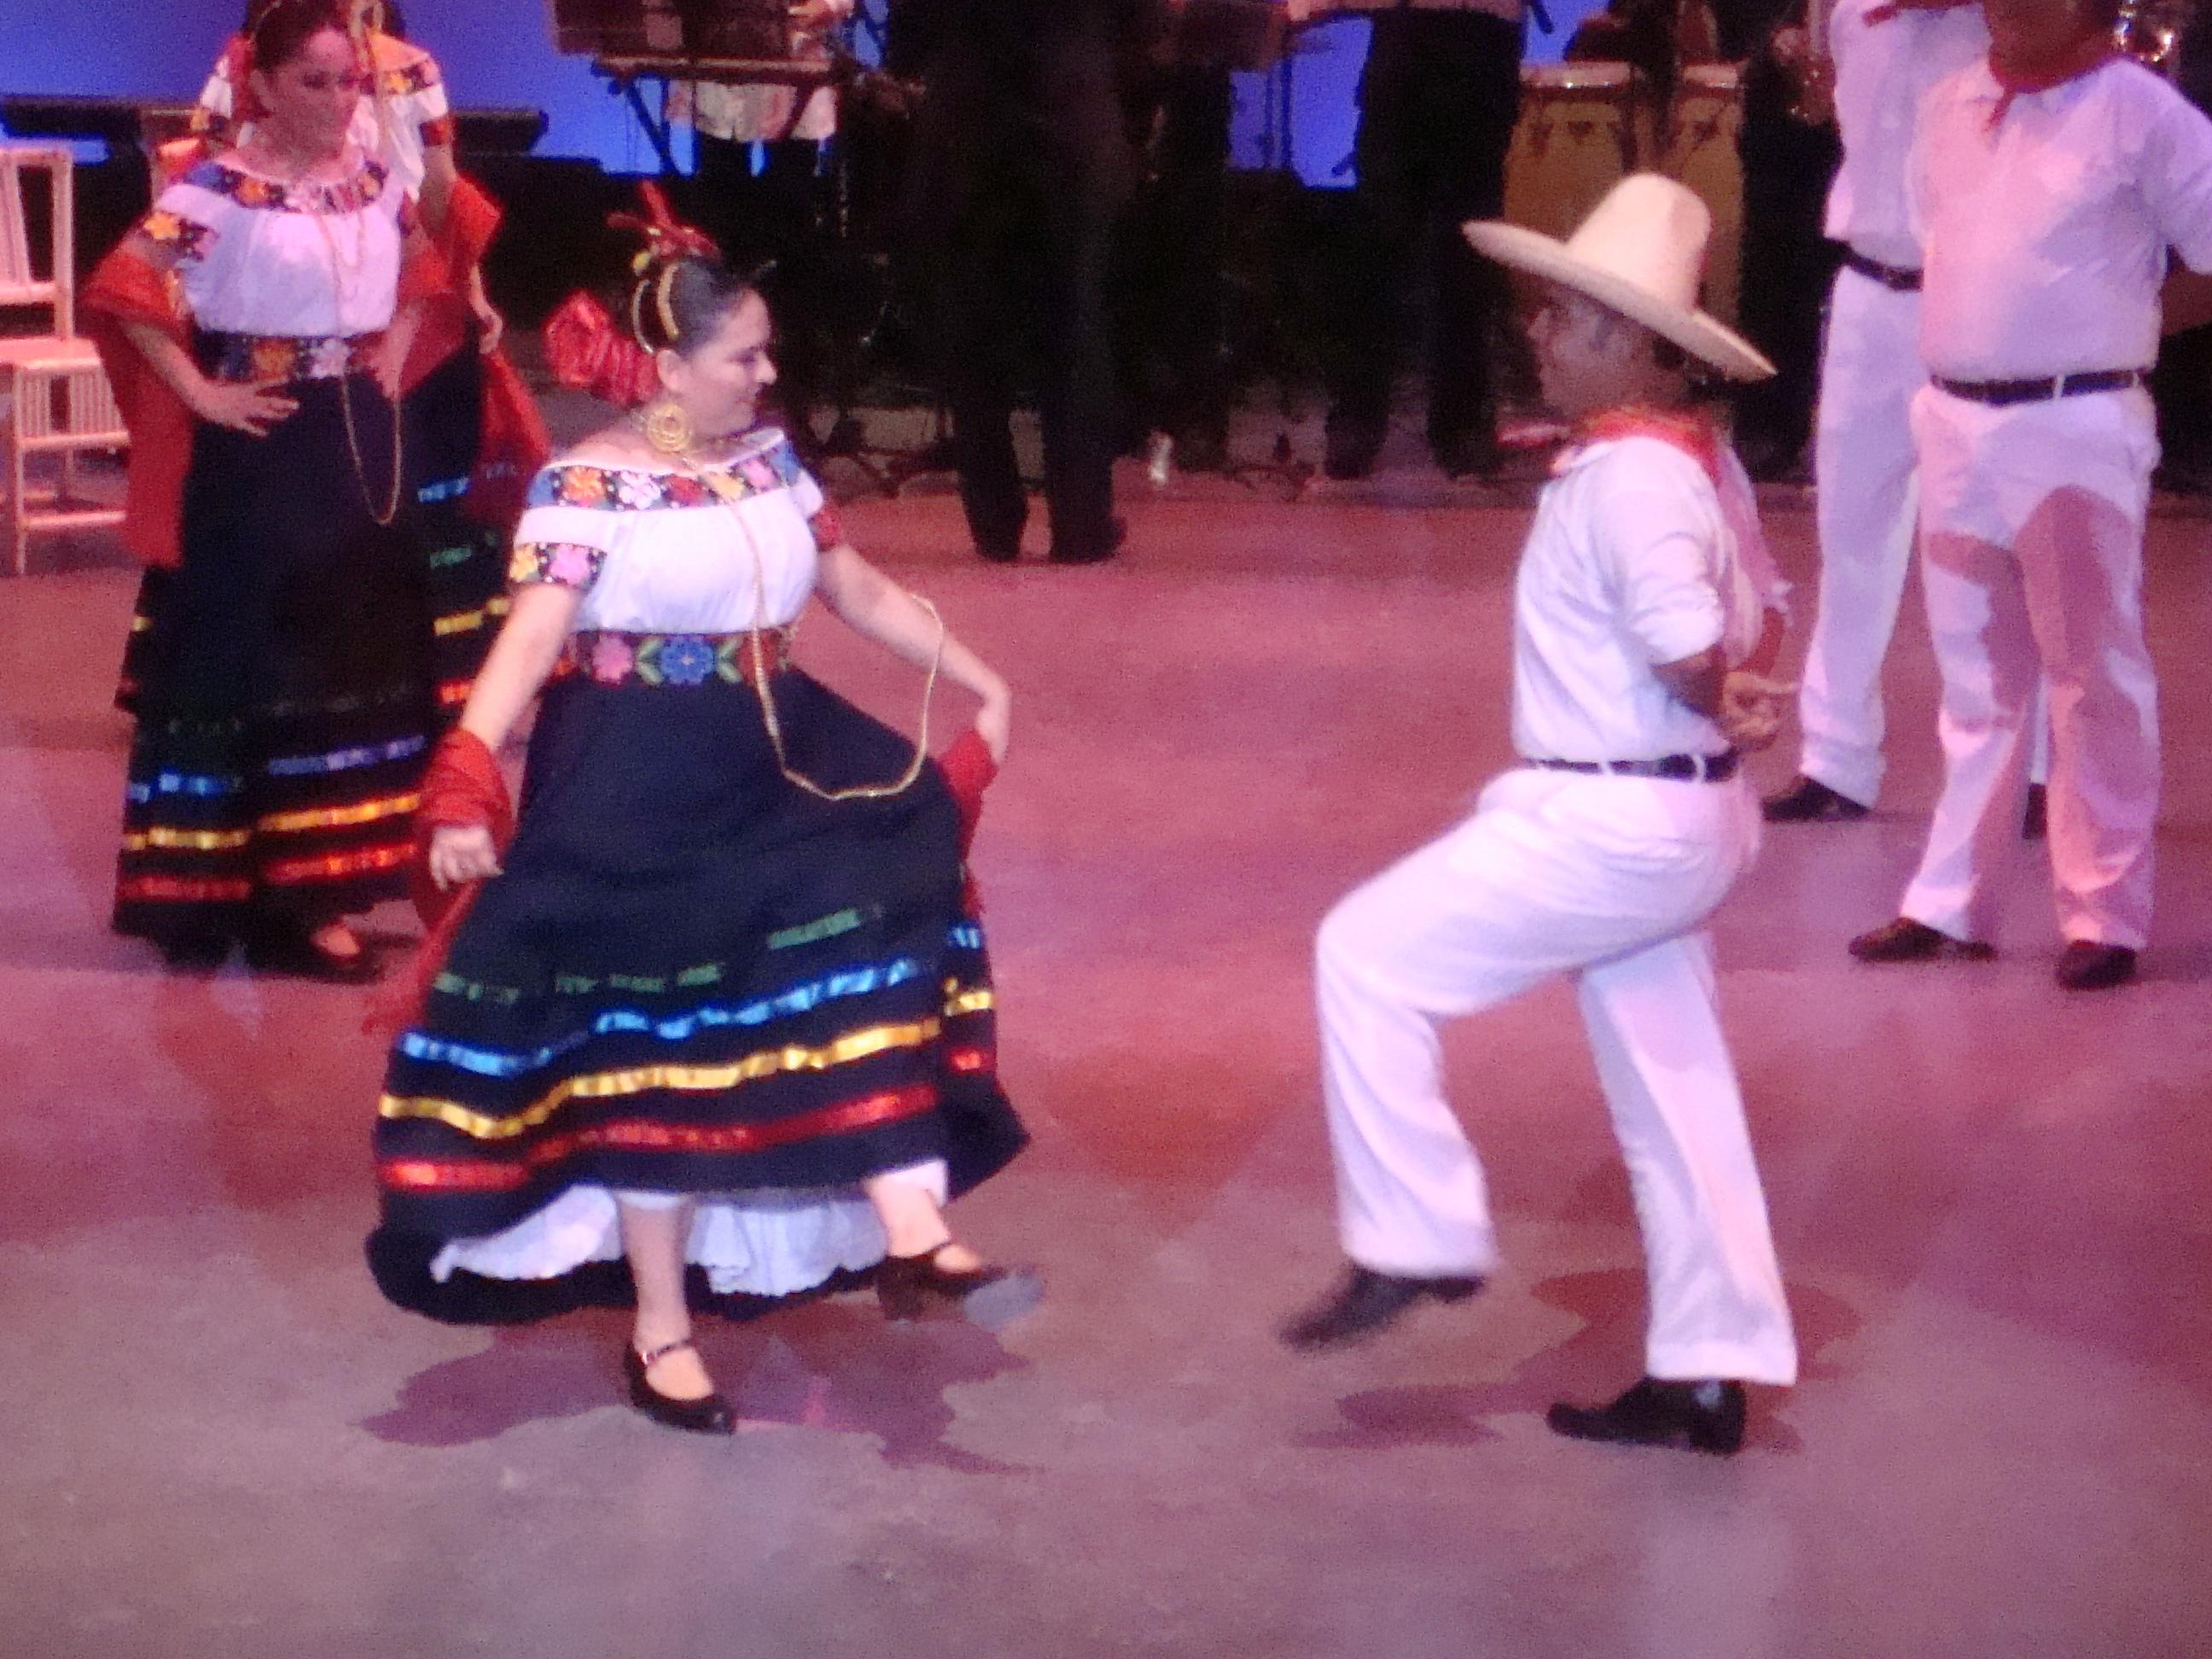 File:Zapateo tabasqueño 1.jpg - Wikipedia, the free encyclopedia